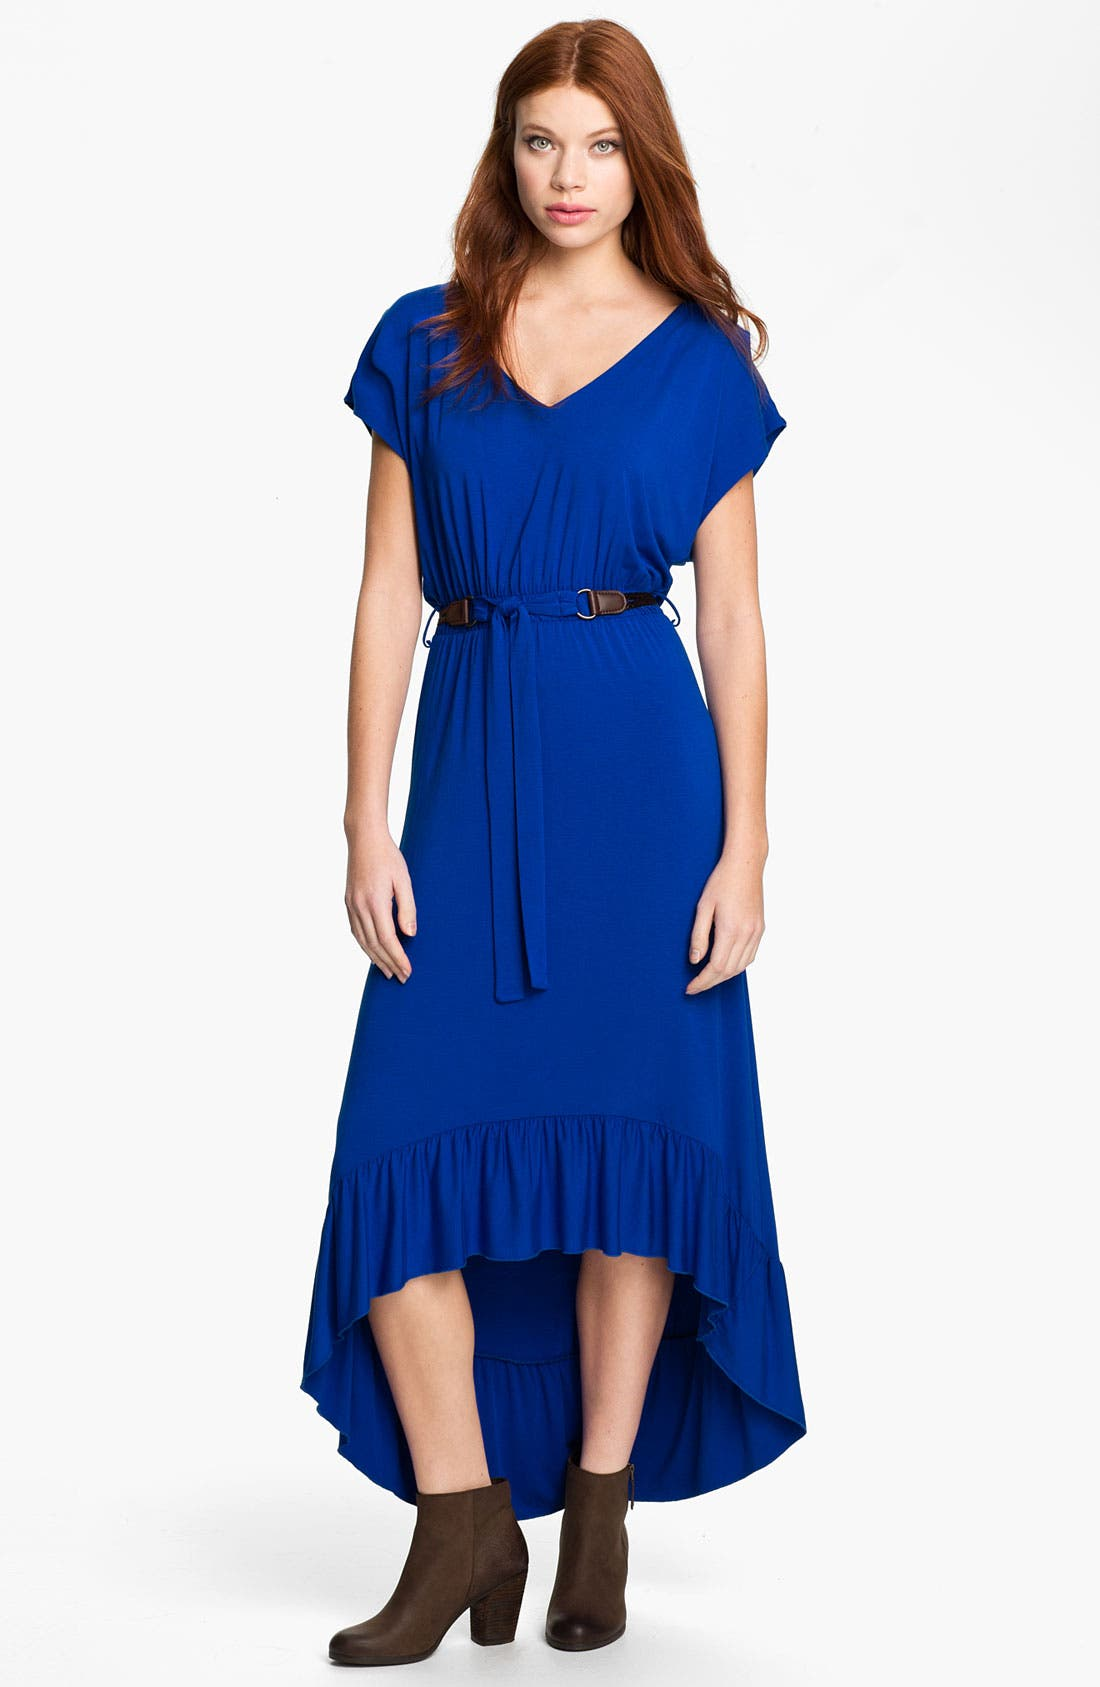 Main Image - Felicity & Coco High/Low Stripe Jersey Dress (Regular & Petite) (Nordstrom Exclusive)